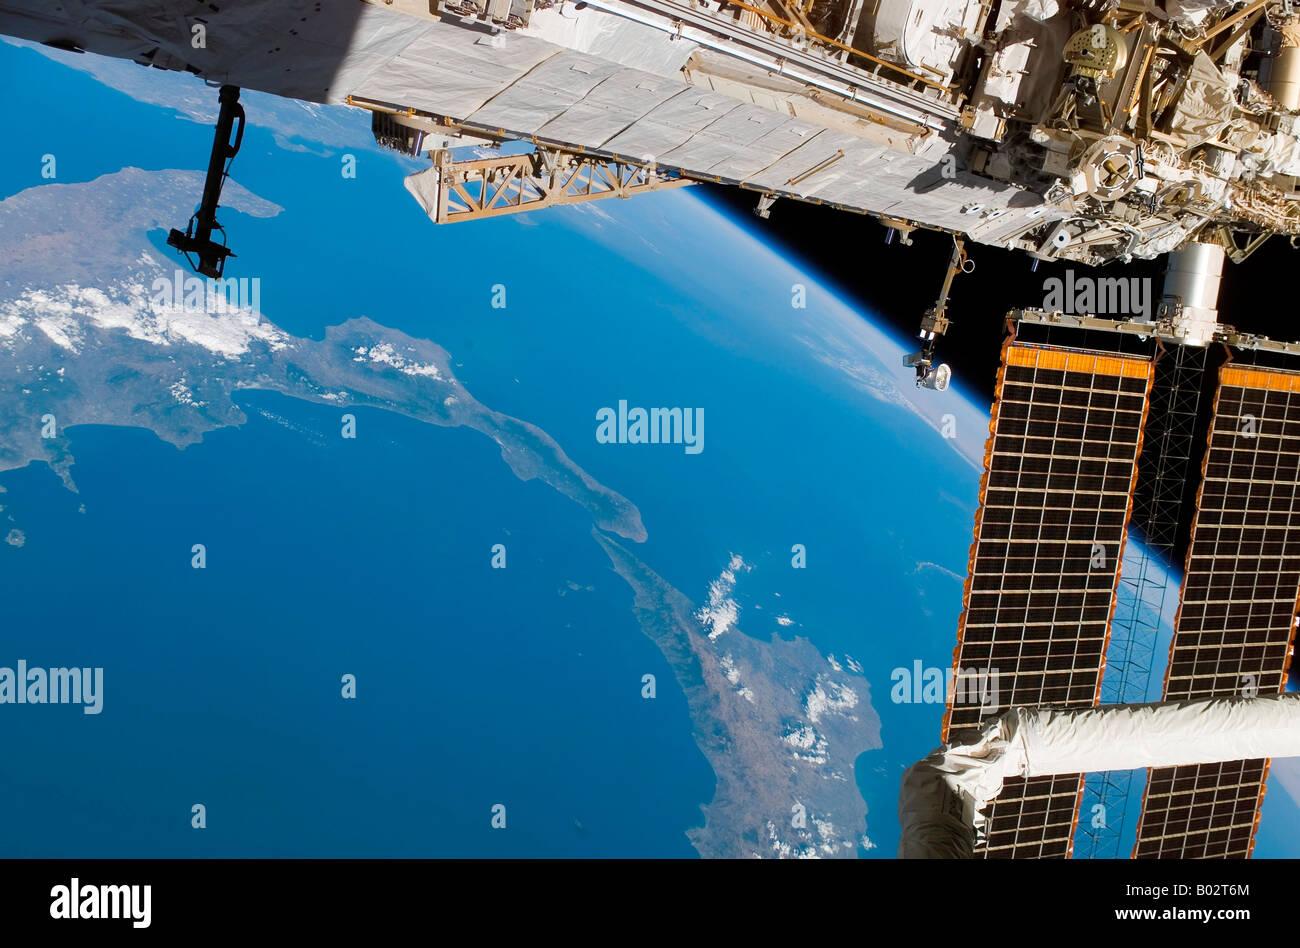 International Space Station - Stock Image